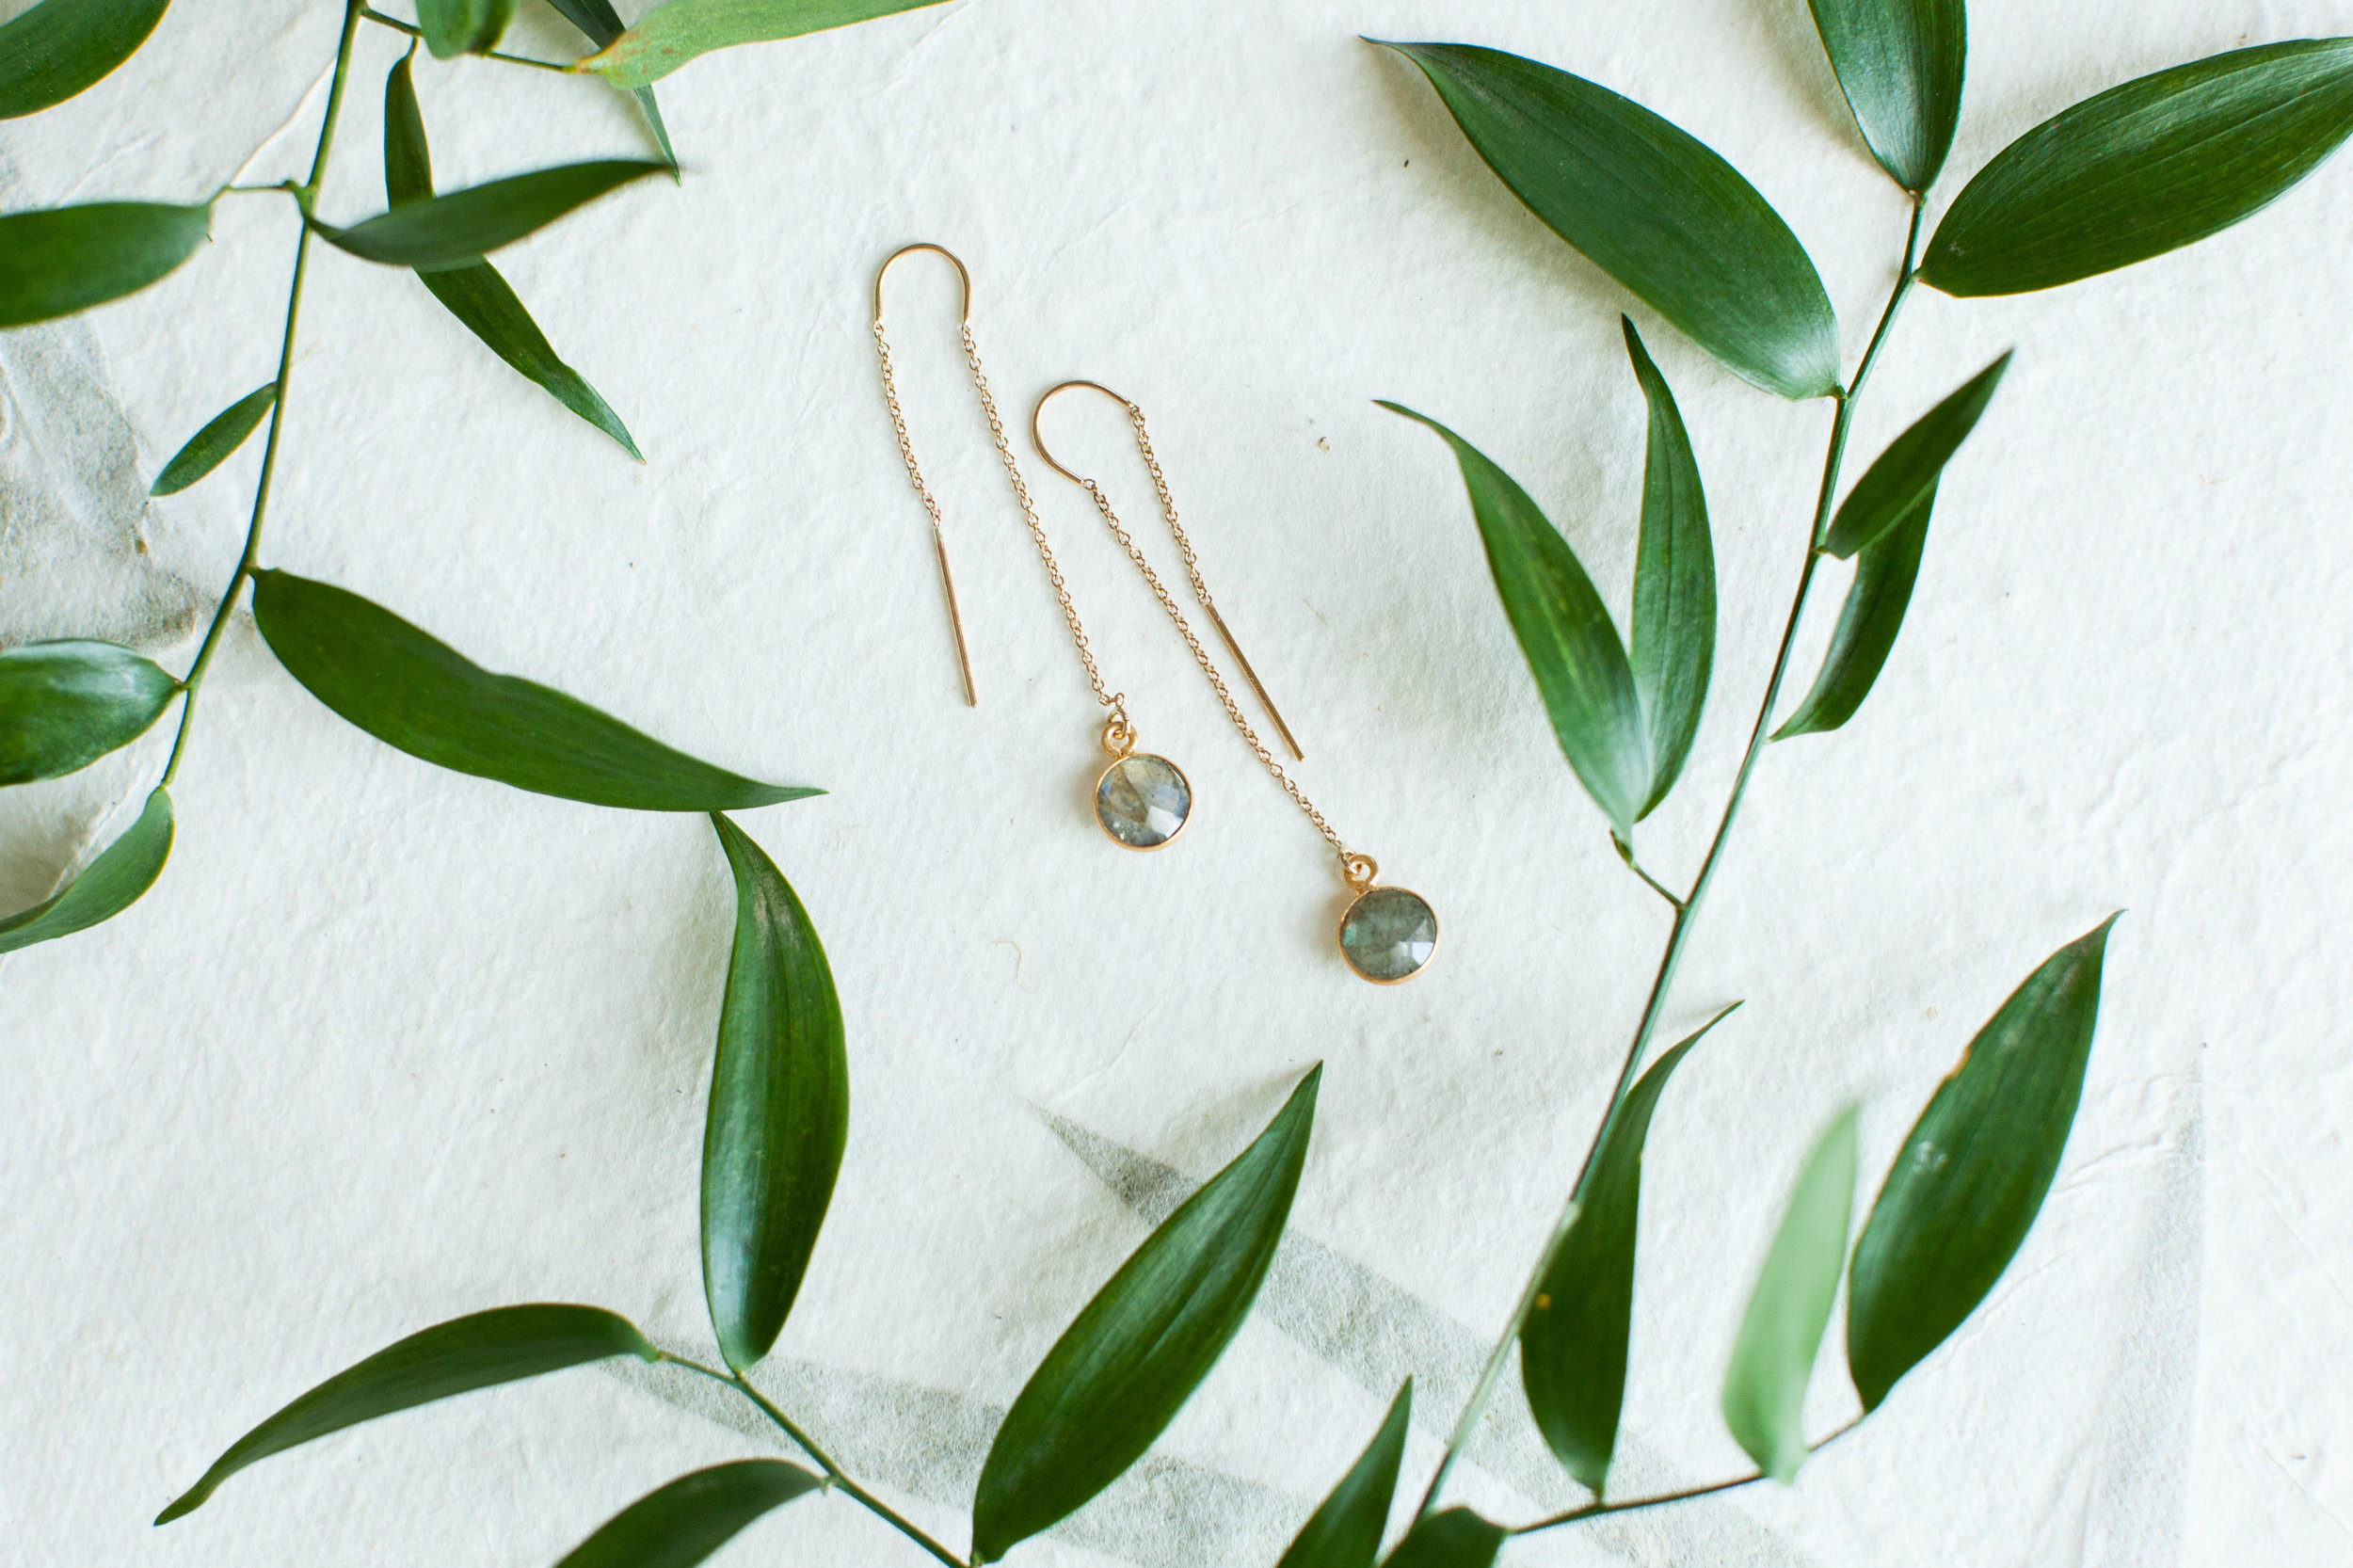 Cale & Cole | Jewelry Care